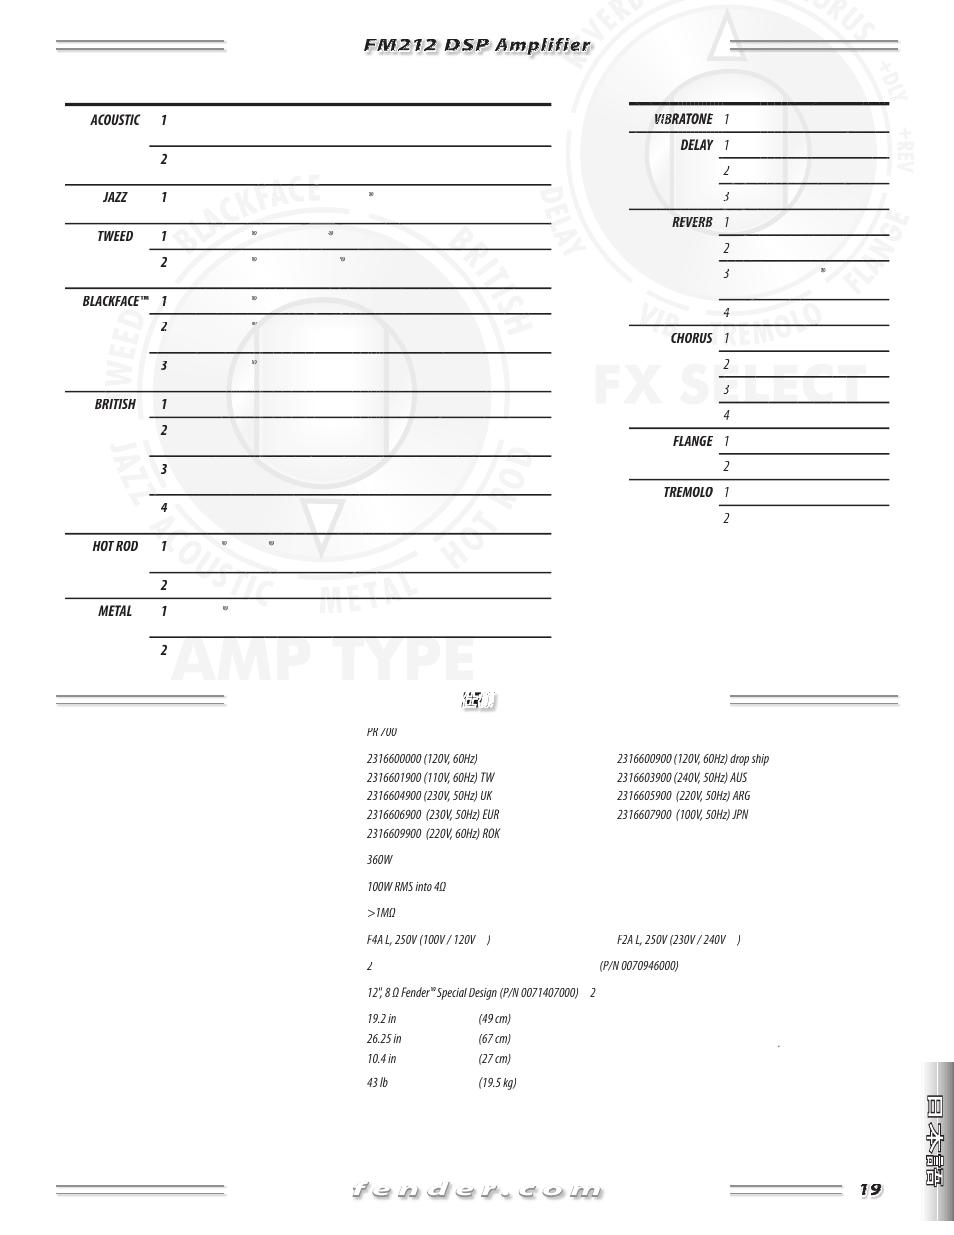 fender fm 212 dsp user manual page 19 20 original mode rh manualsdir com Fender Frontman 212R Amp Settings Fender Amps